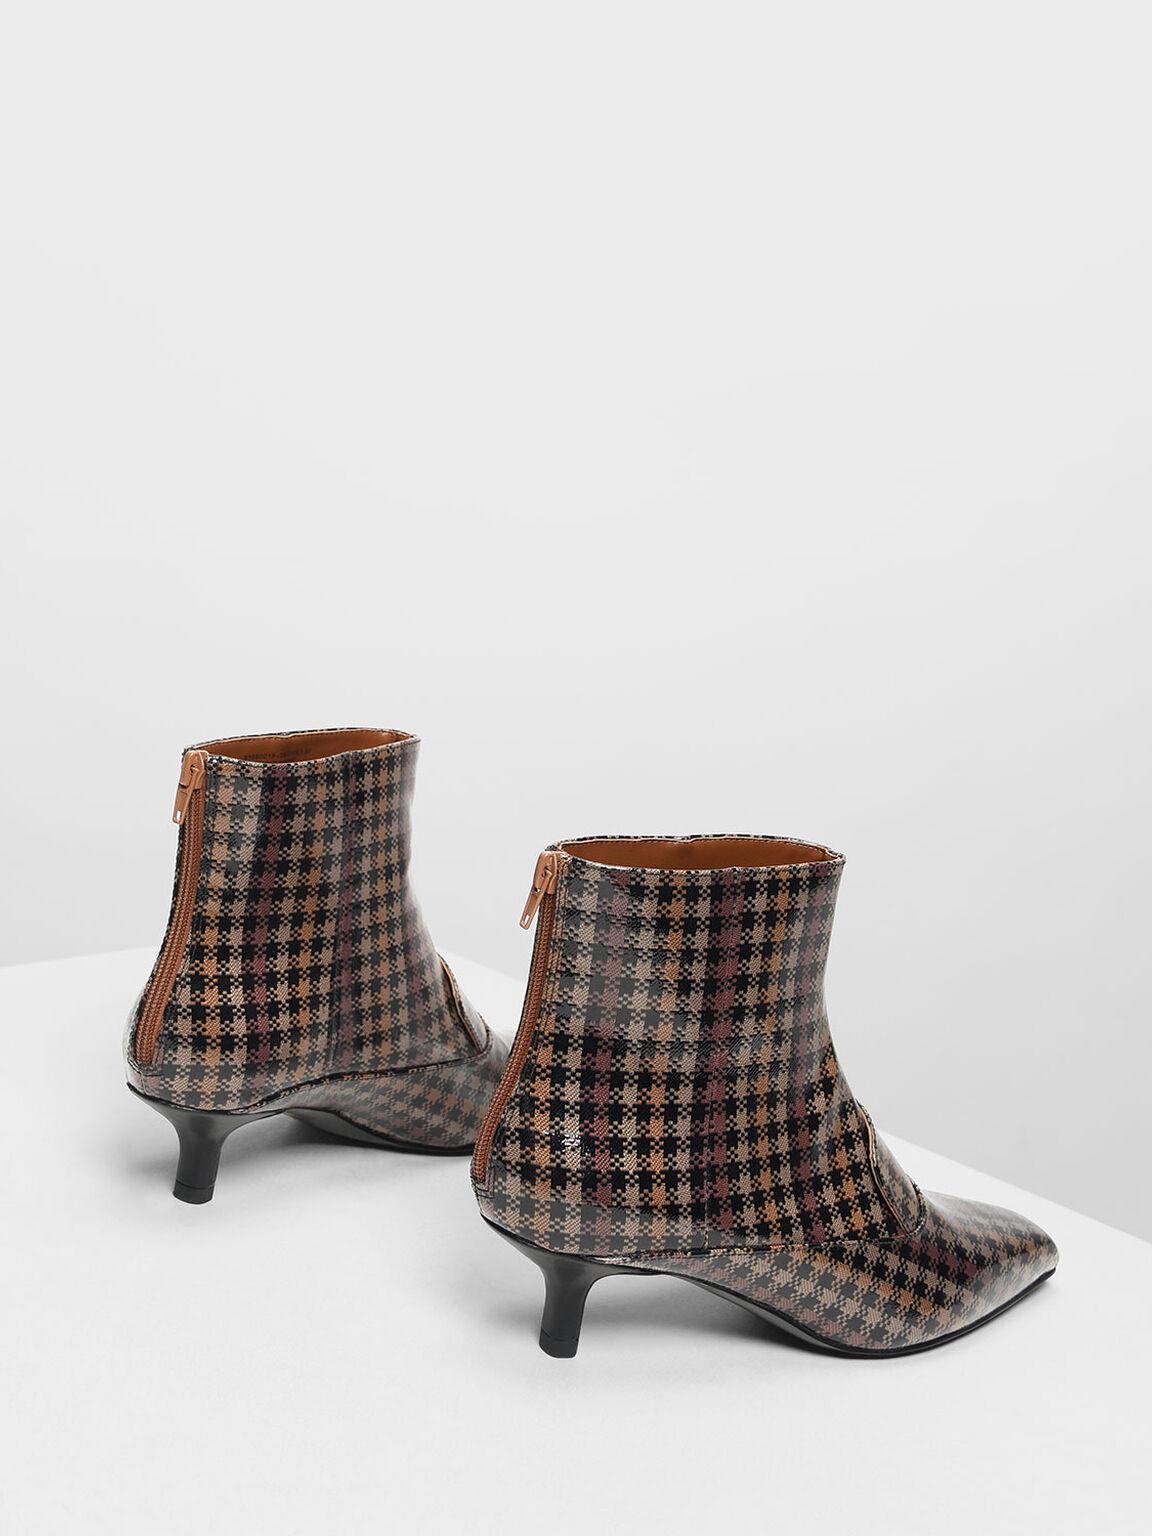 Loafer Detail Ankle Boots, Brown, hi-res